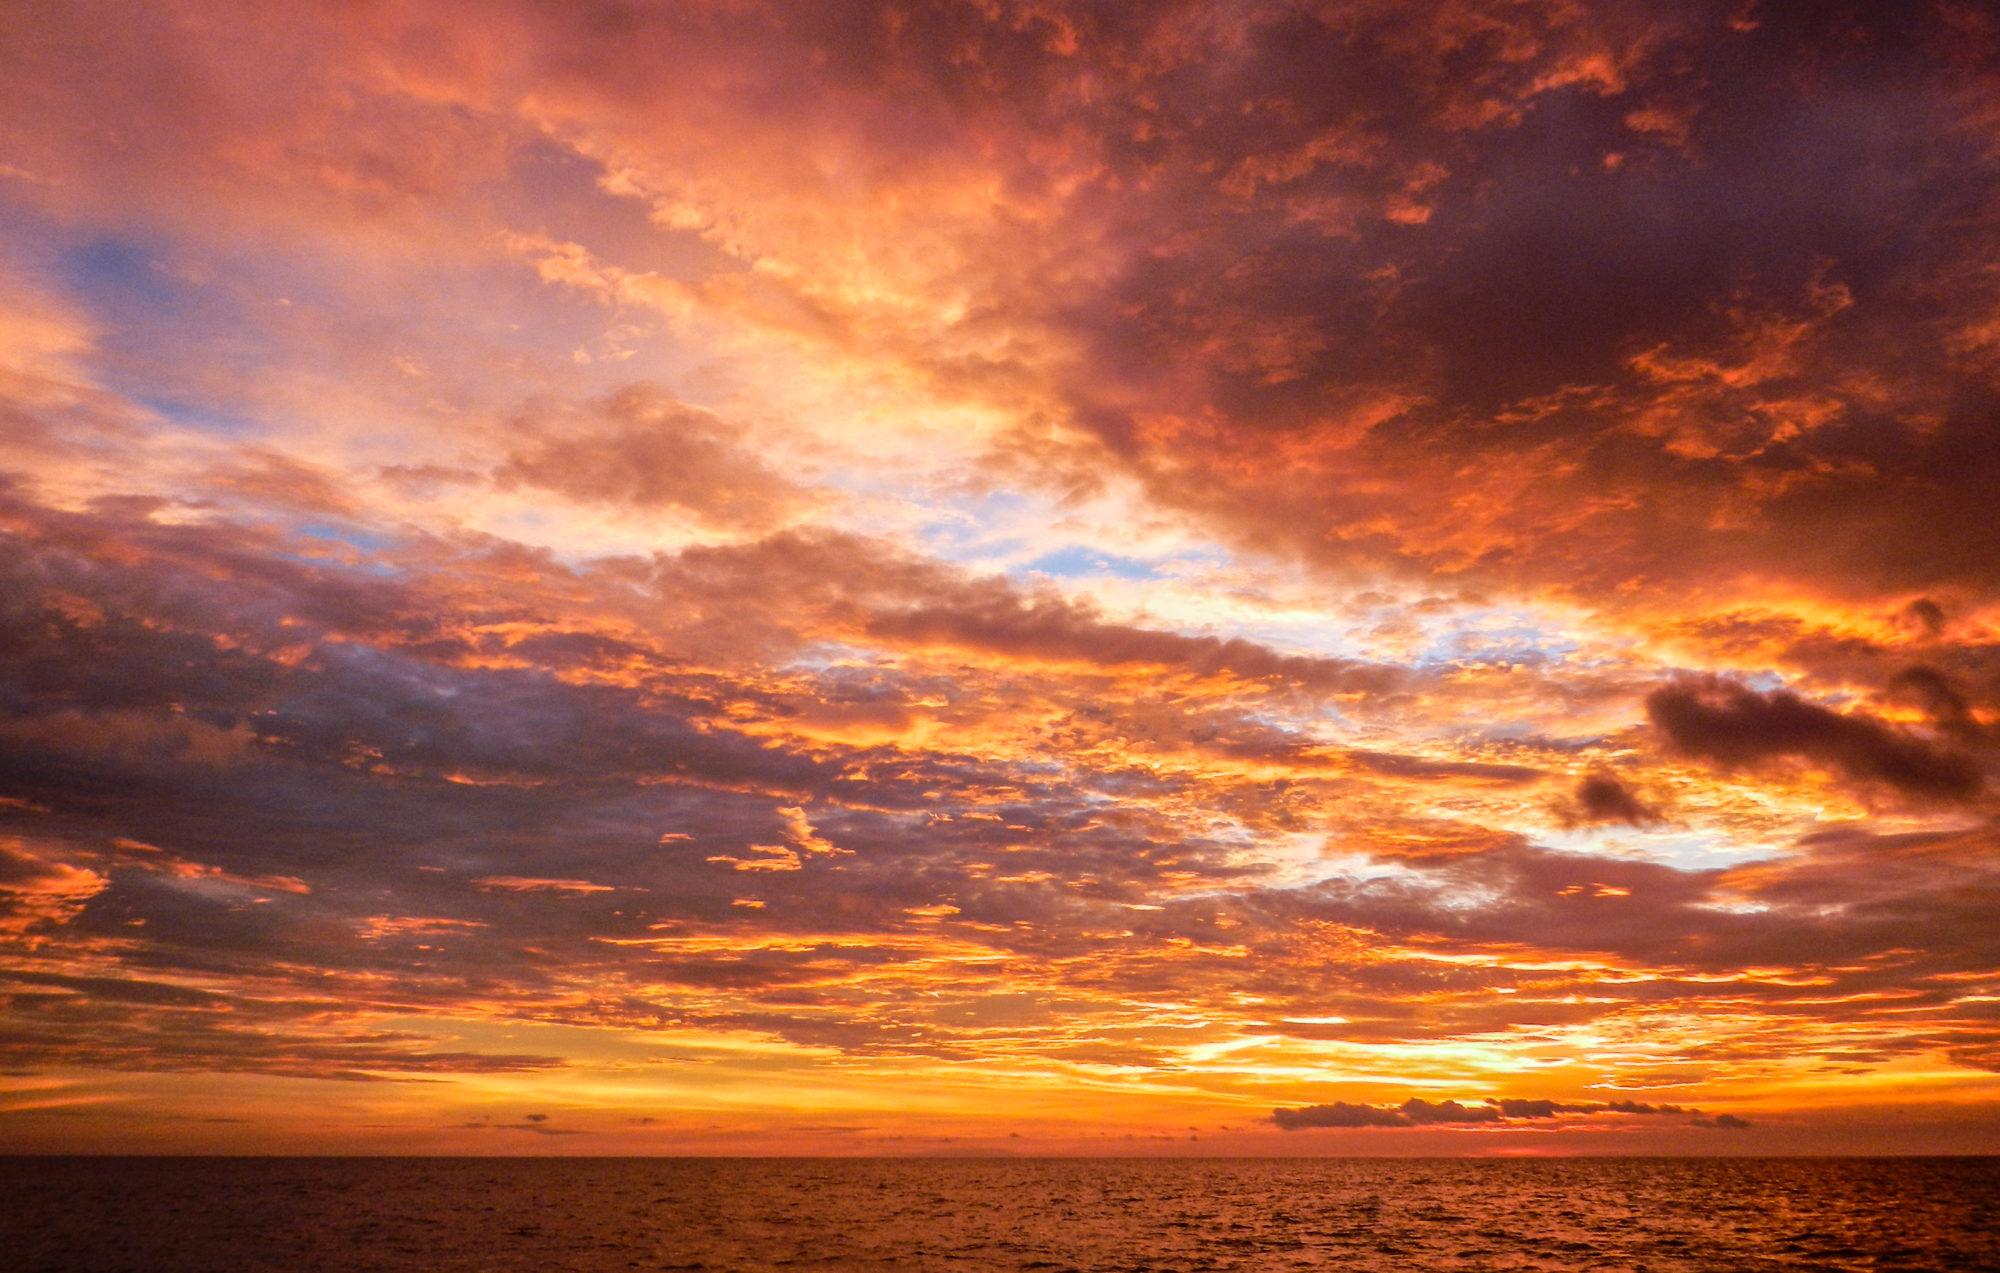 Sunset Sunday - San Juan Del Sur, Nicaragua | Getting Stamped